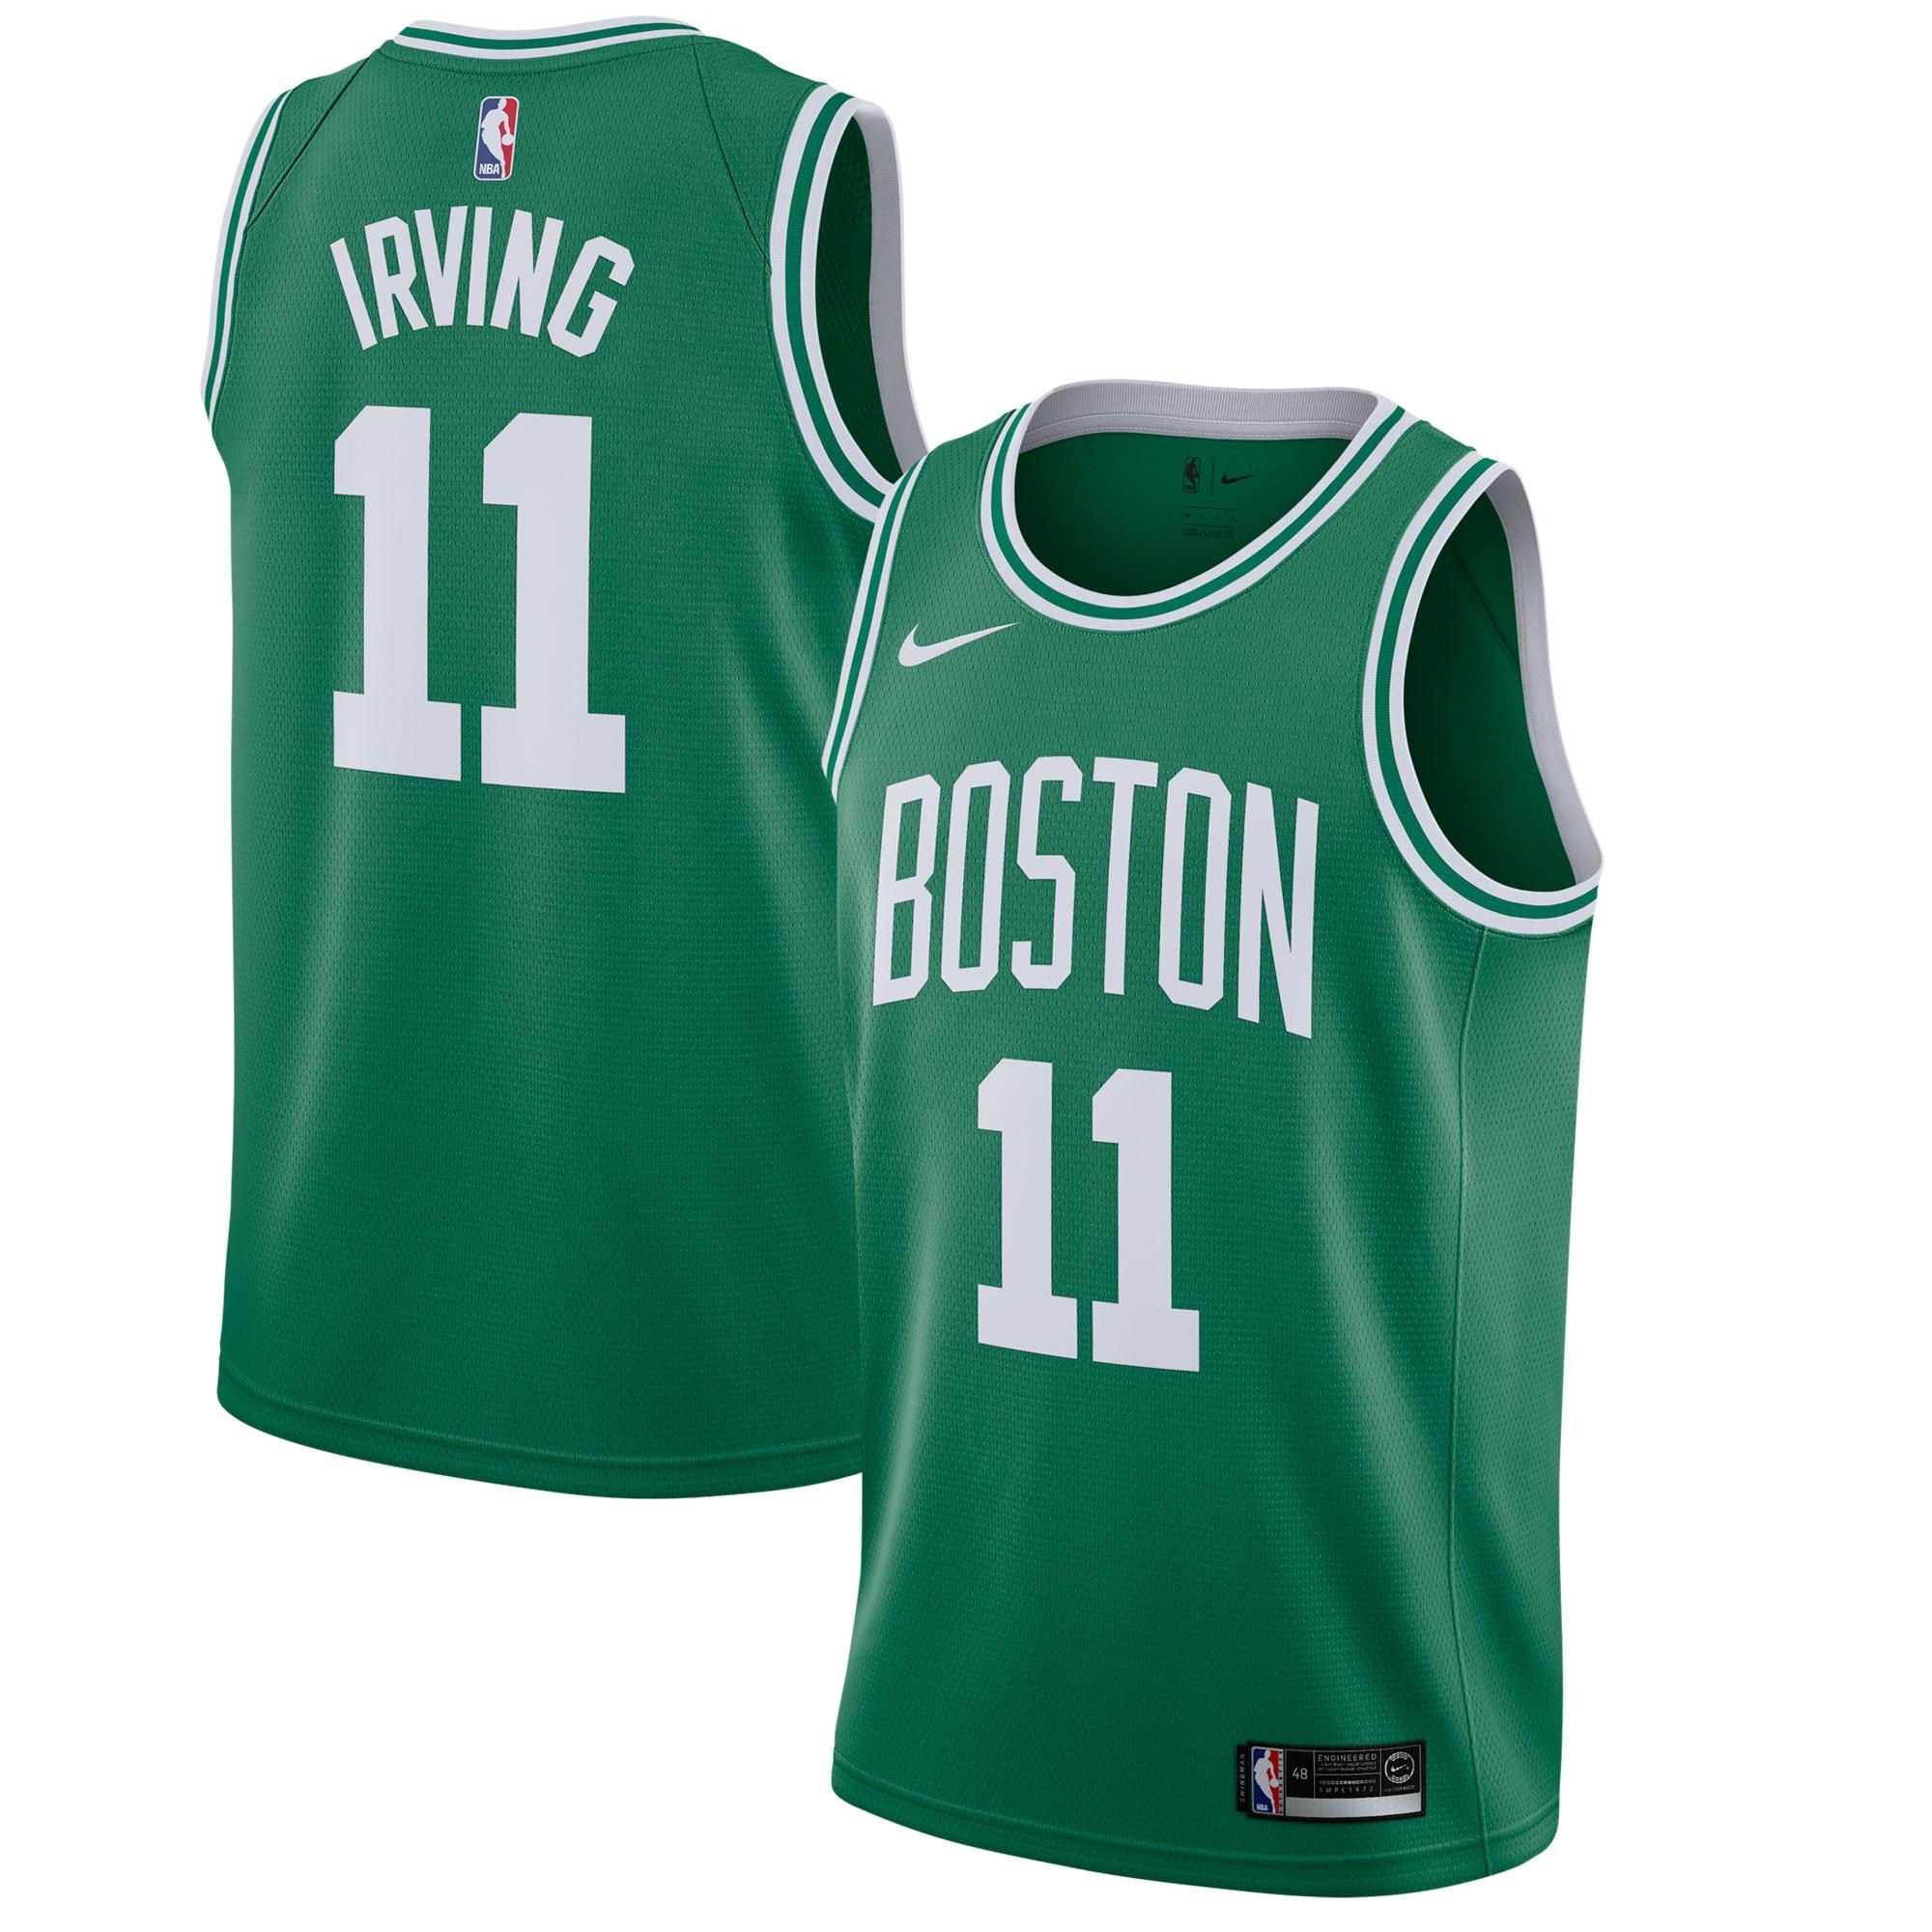 Kyrie Irving Boston Celtics Nike Swingman Jersey - Kelly Green - Icon Edition